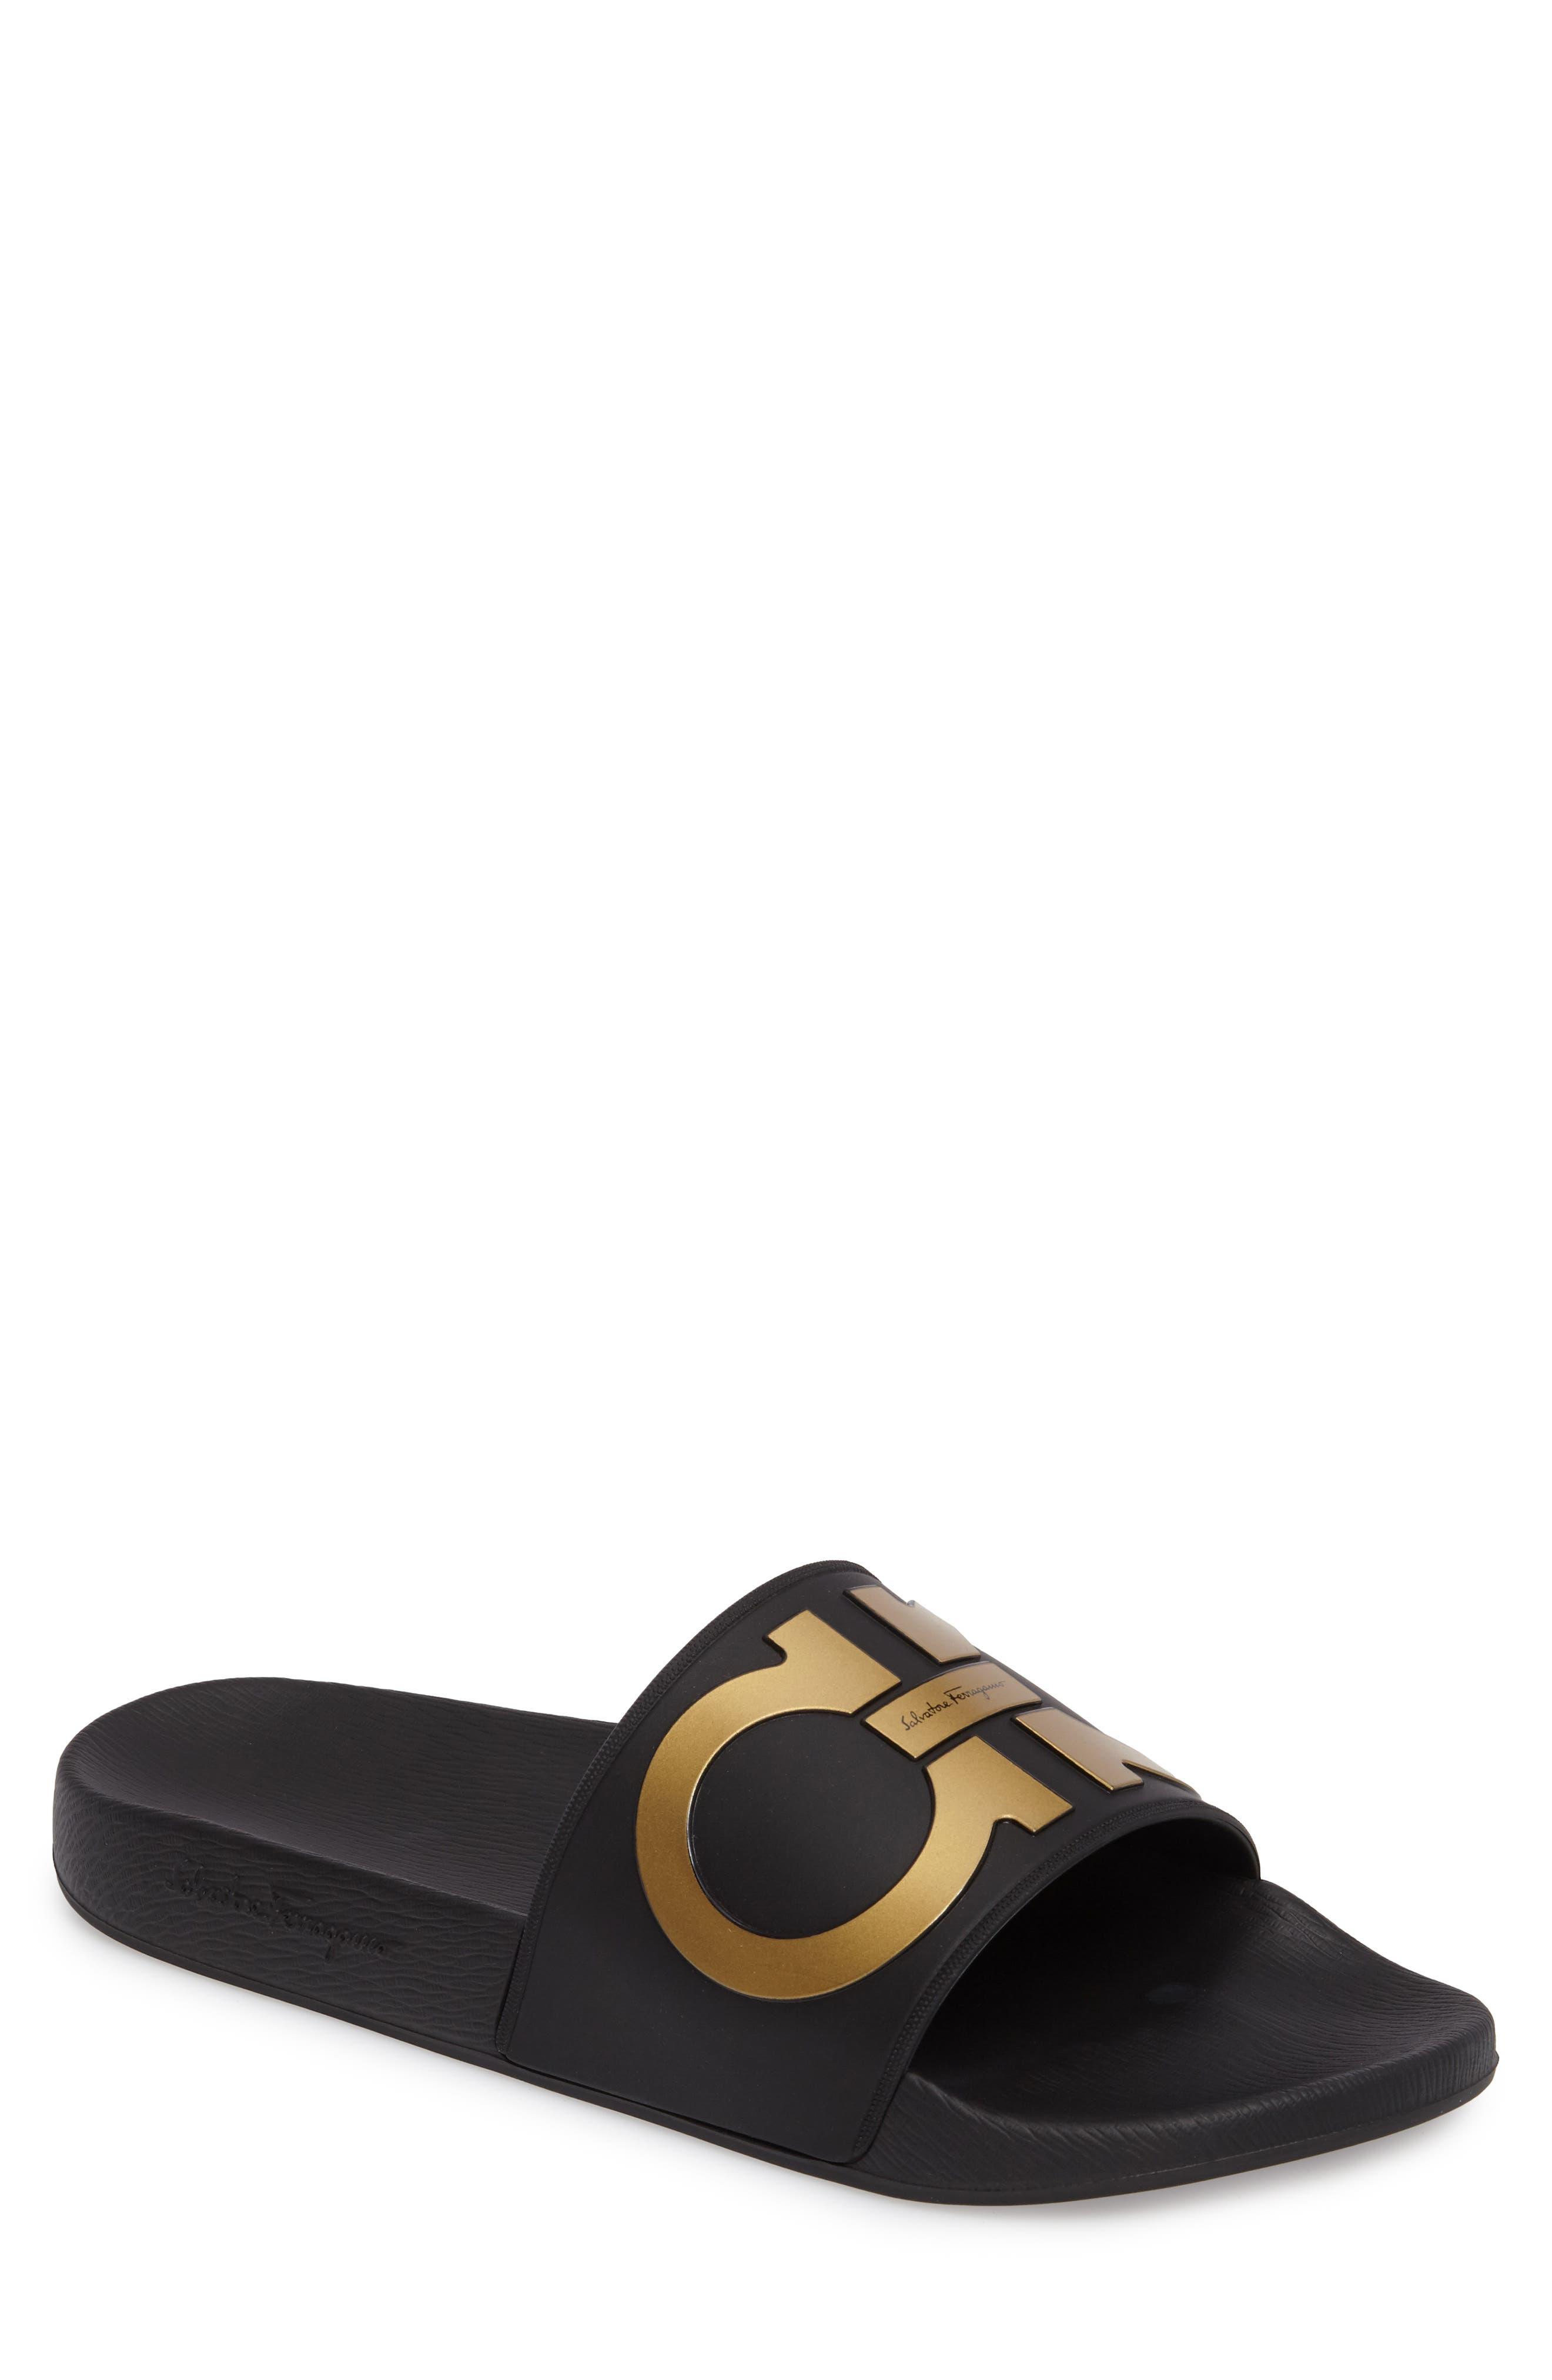 SALVATORE FERRAGAMO Groove 2 Slide Sandal, Main, color, BLACK/GOLD